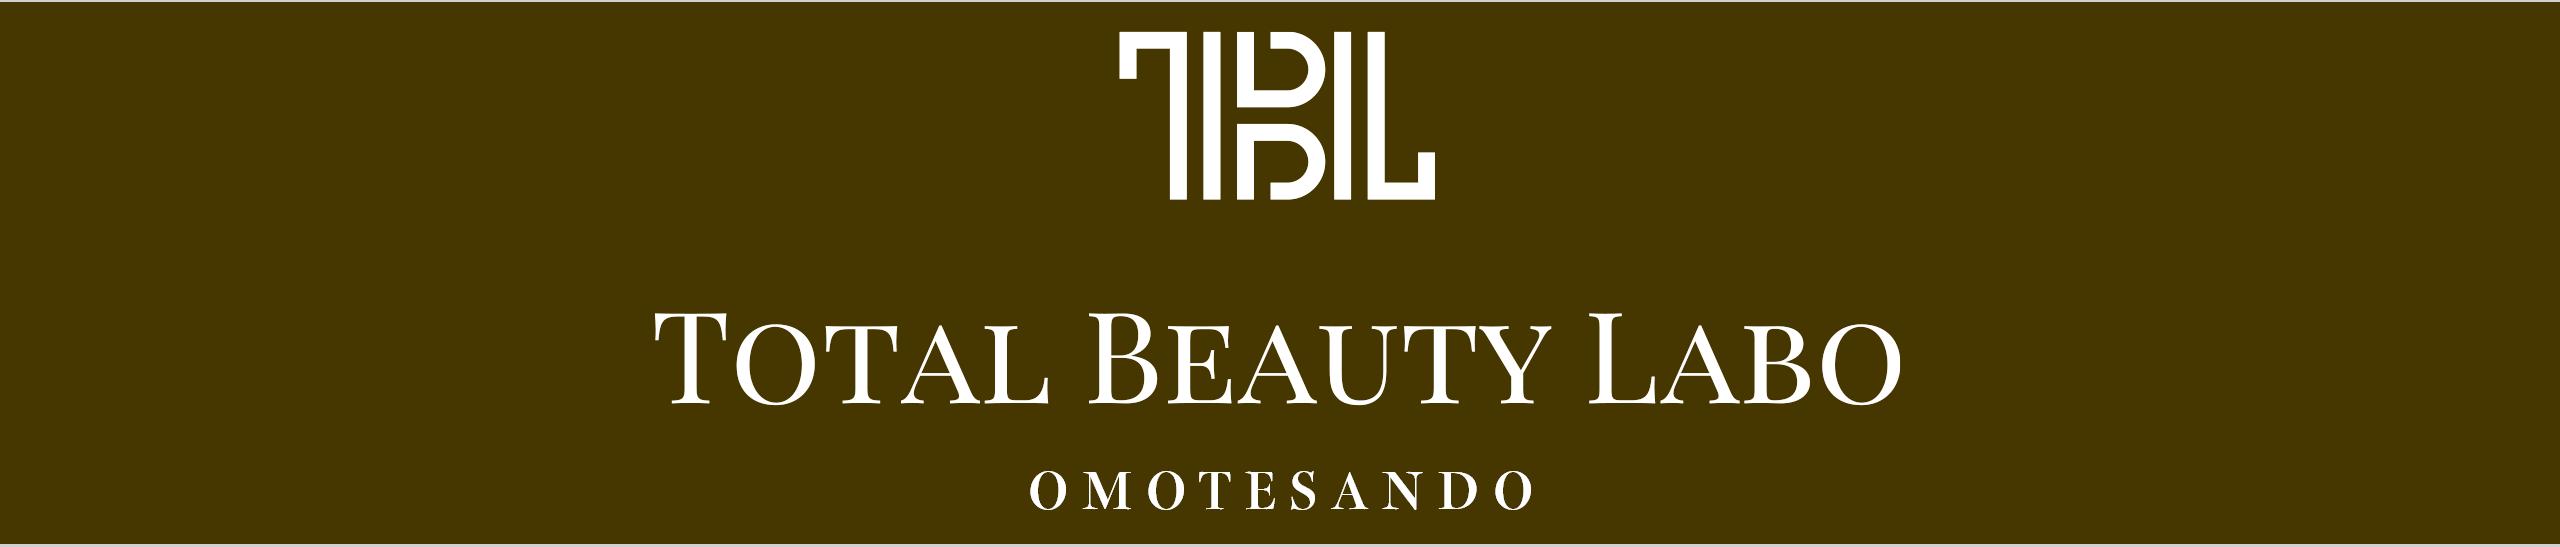 Total Beauty Labo